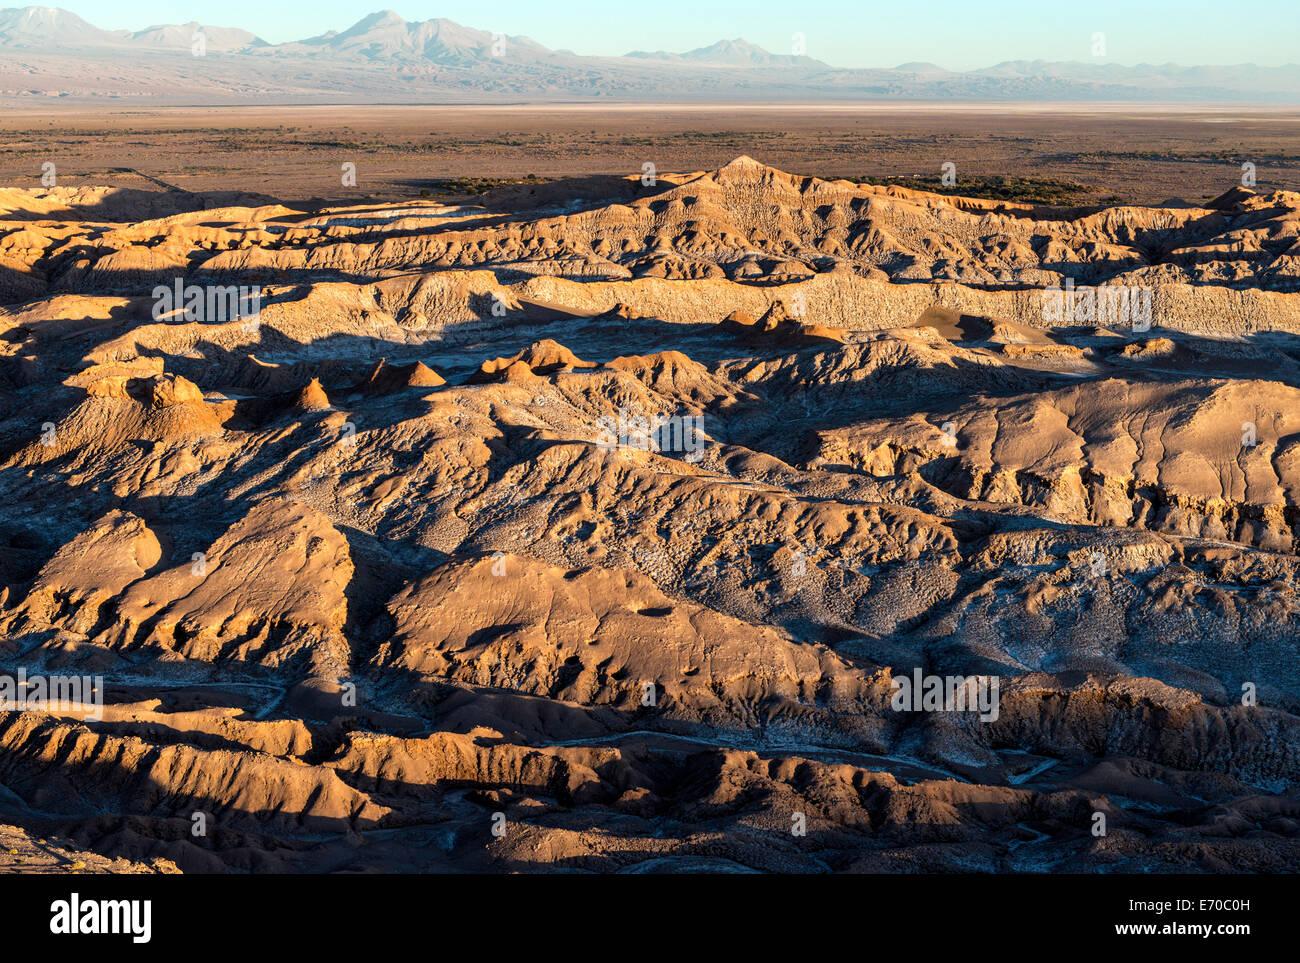 Moon Valley San Pedro de Atacama Chile South America - Stock Image